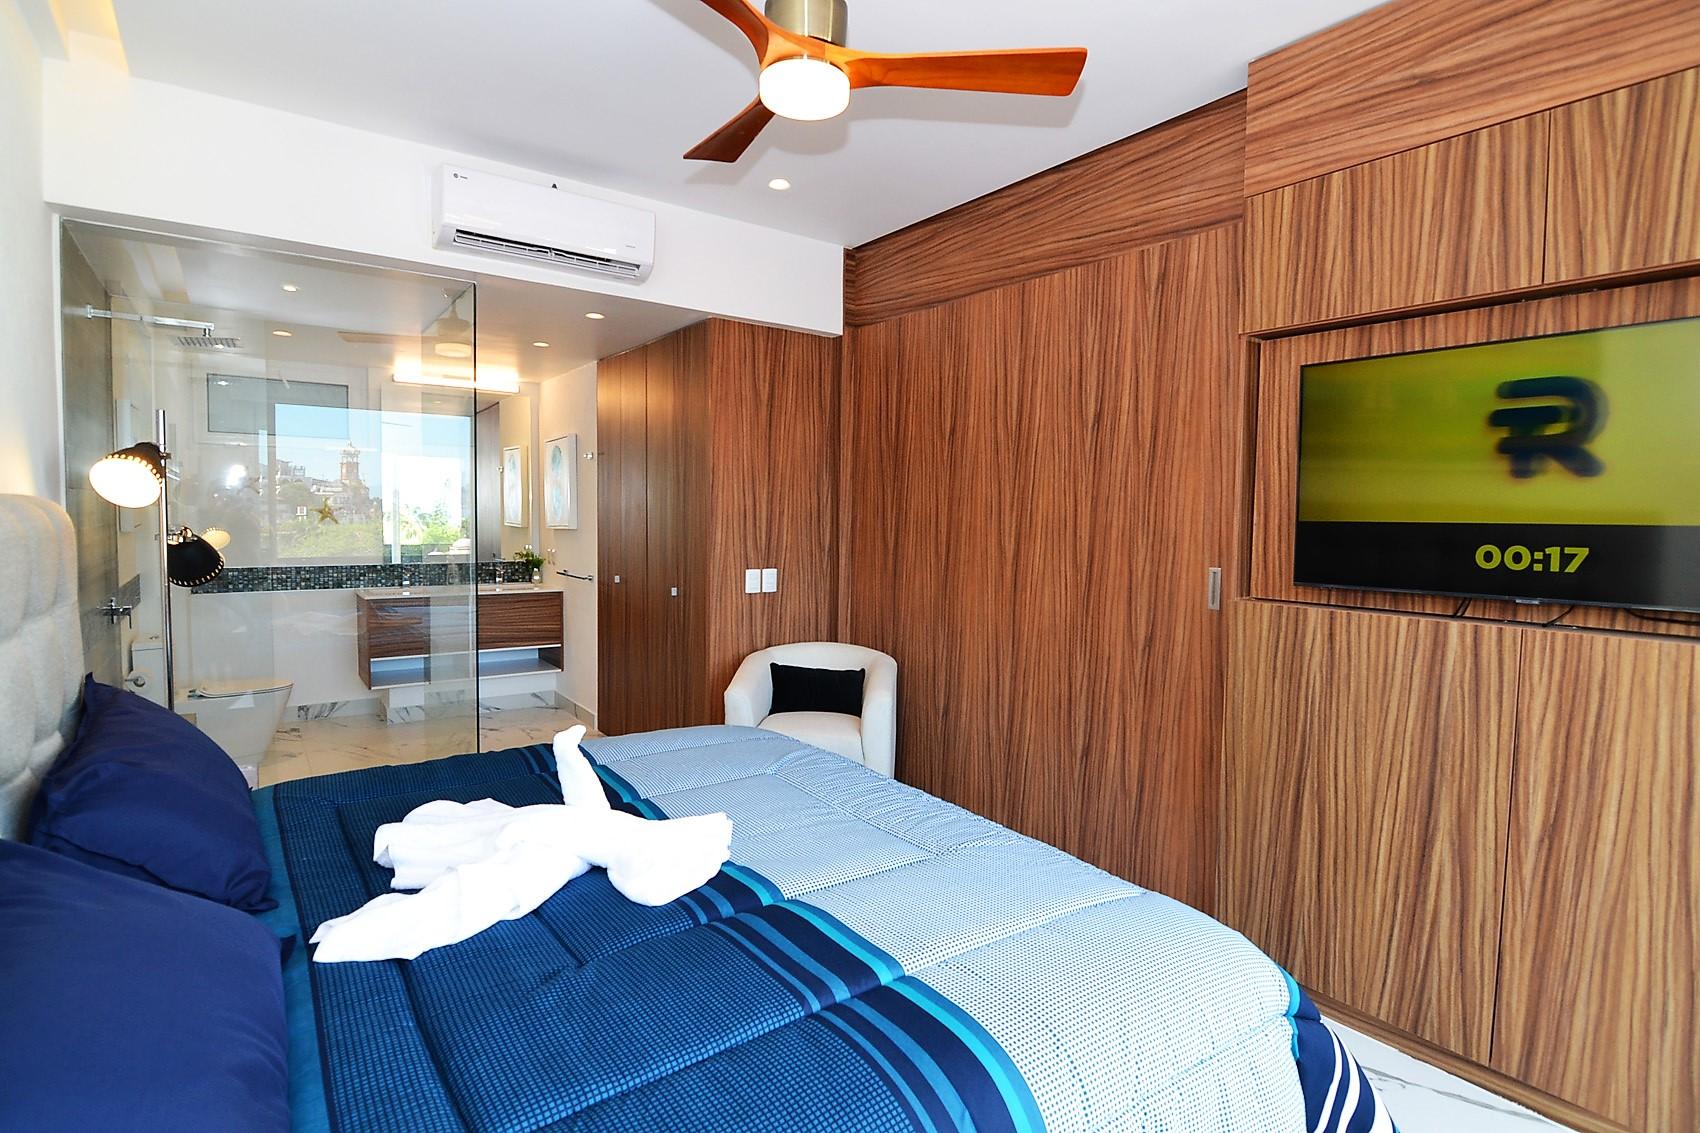 Condo Avida Super Studio 4 - Puerto Vallarta Furnished Condo Romantic Zone (35)